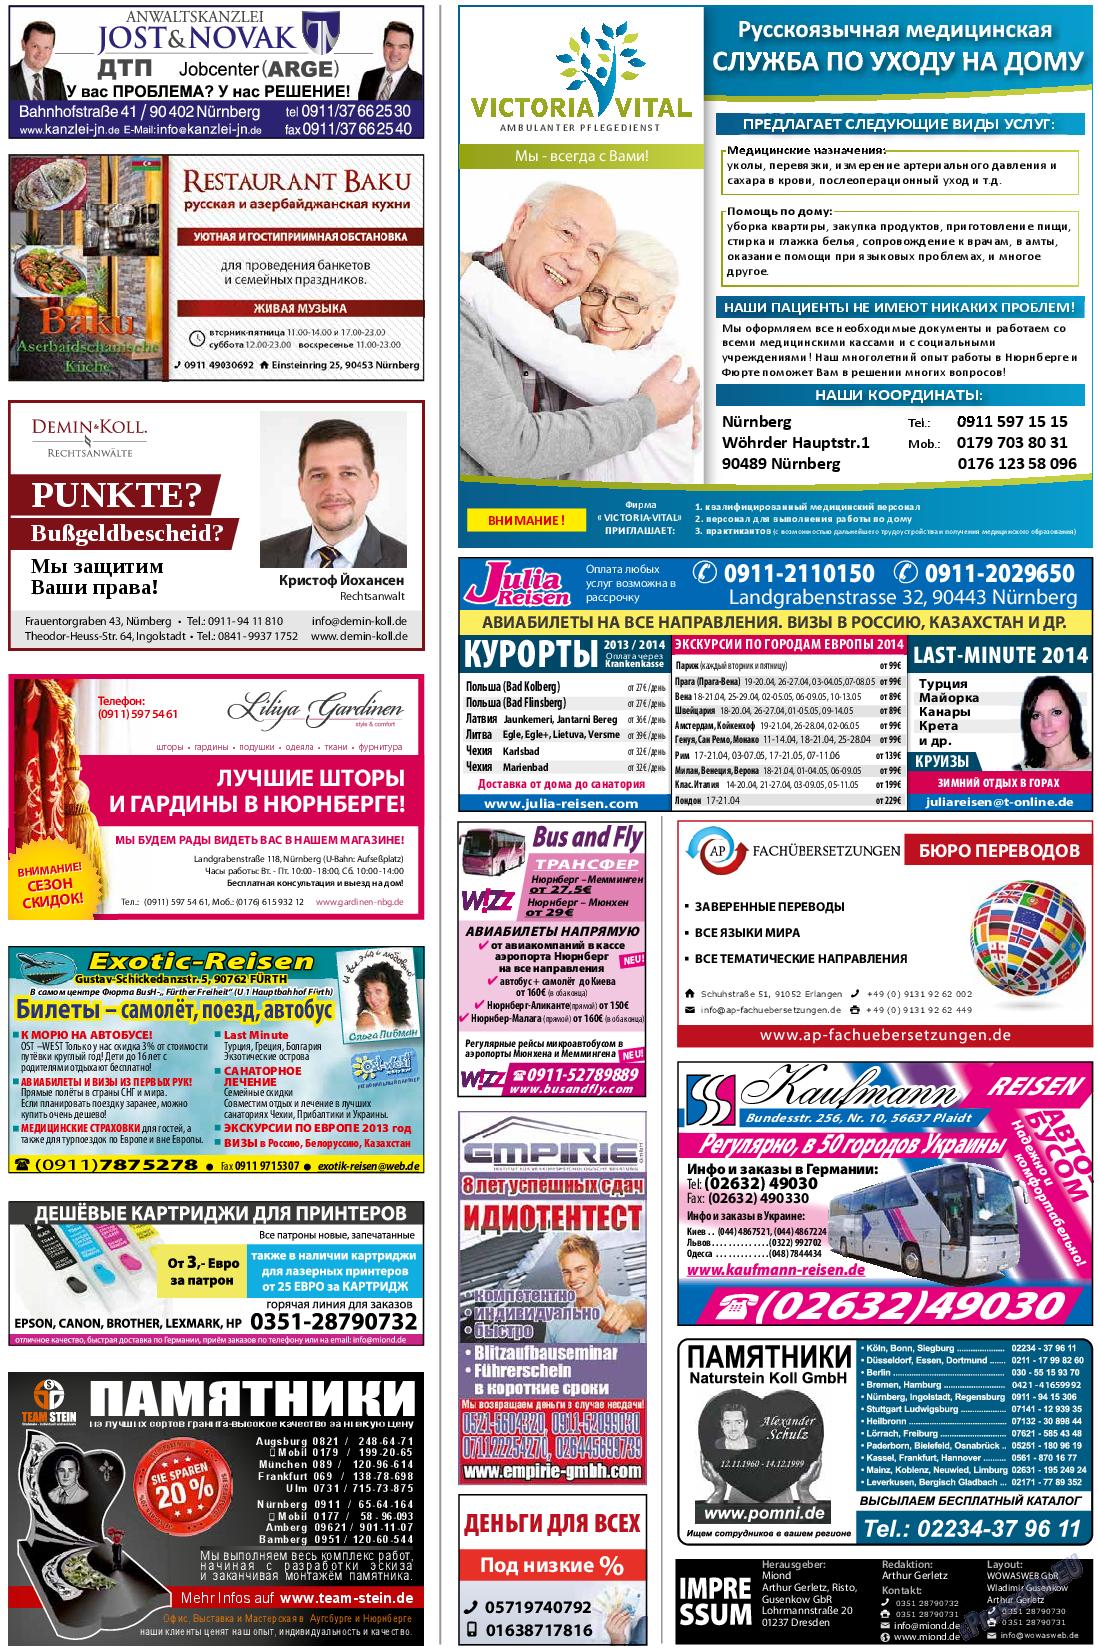 Новая Wолна (газета). 2014 год, номер 15, стр. 16